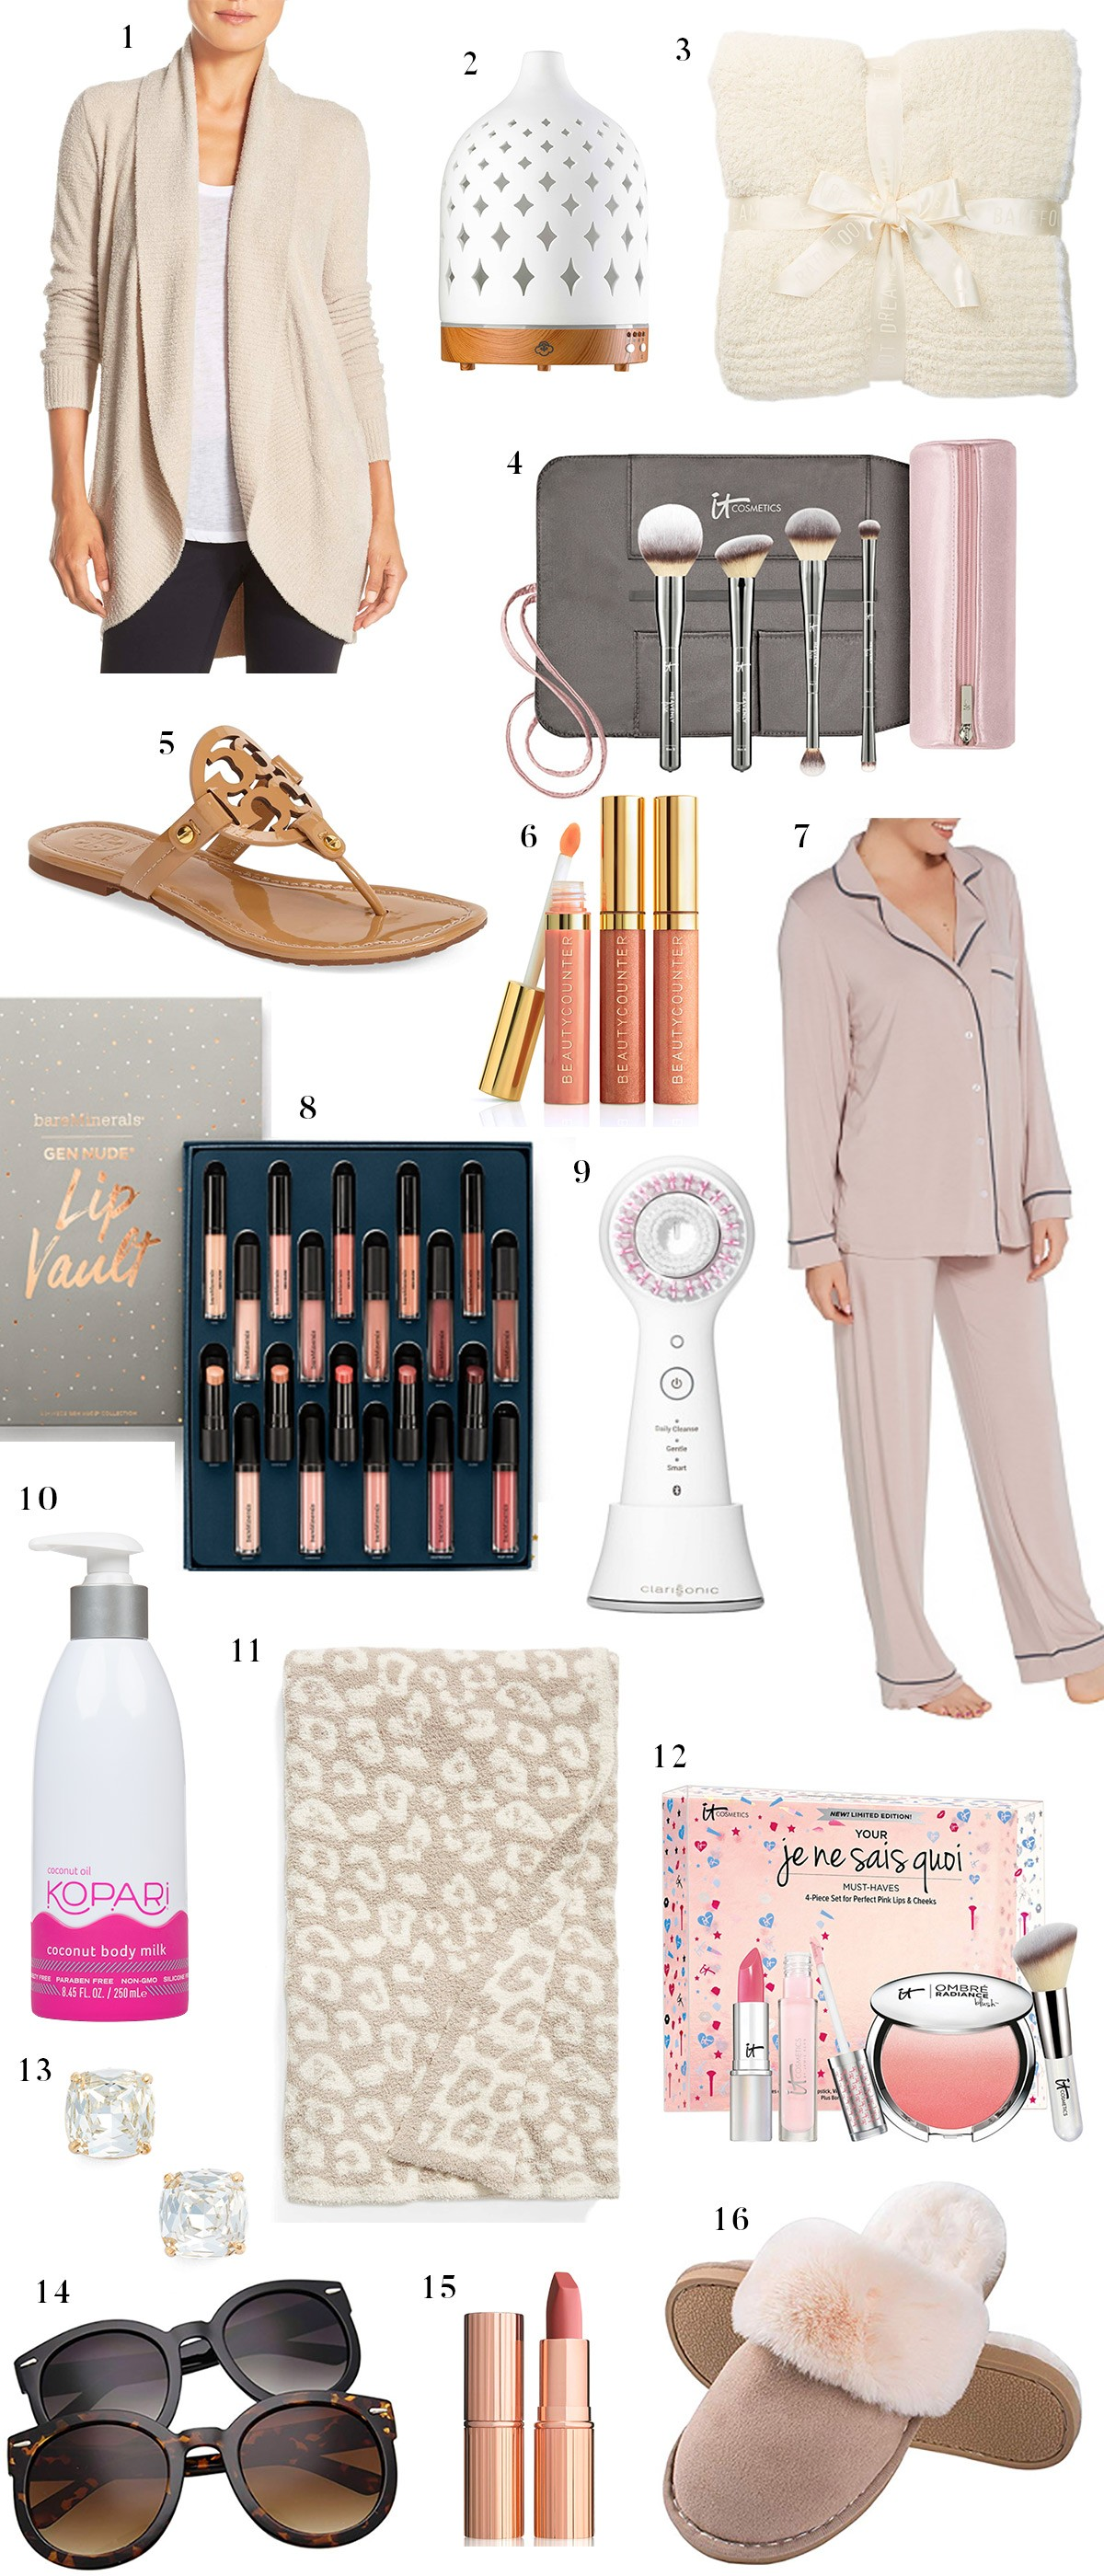 Womens Christmas Gifts 2019.2019 Top Christmas Gifts For Women Ashley Brooke Nicholas